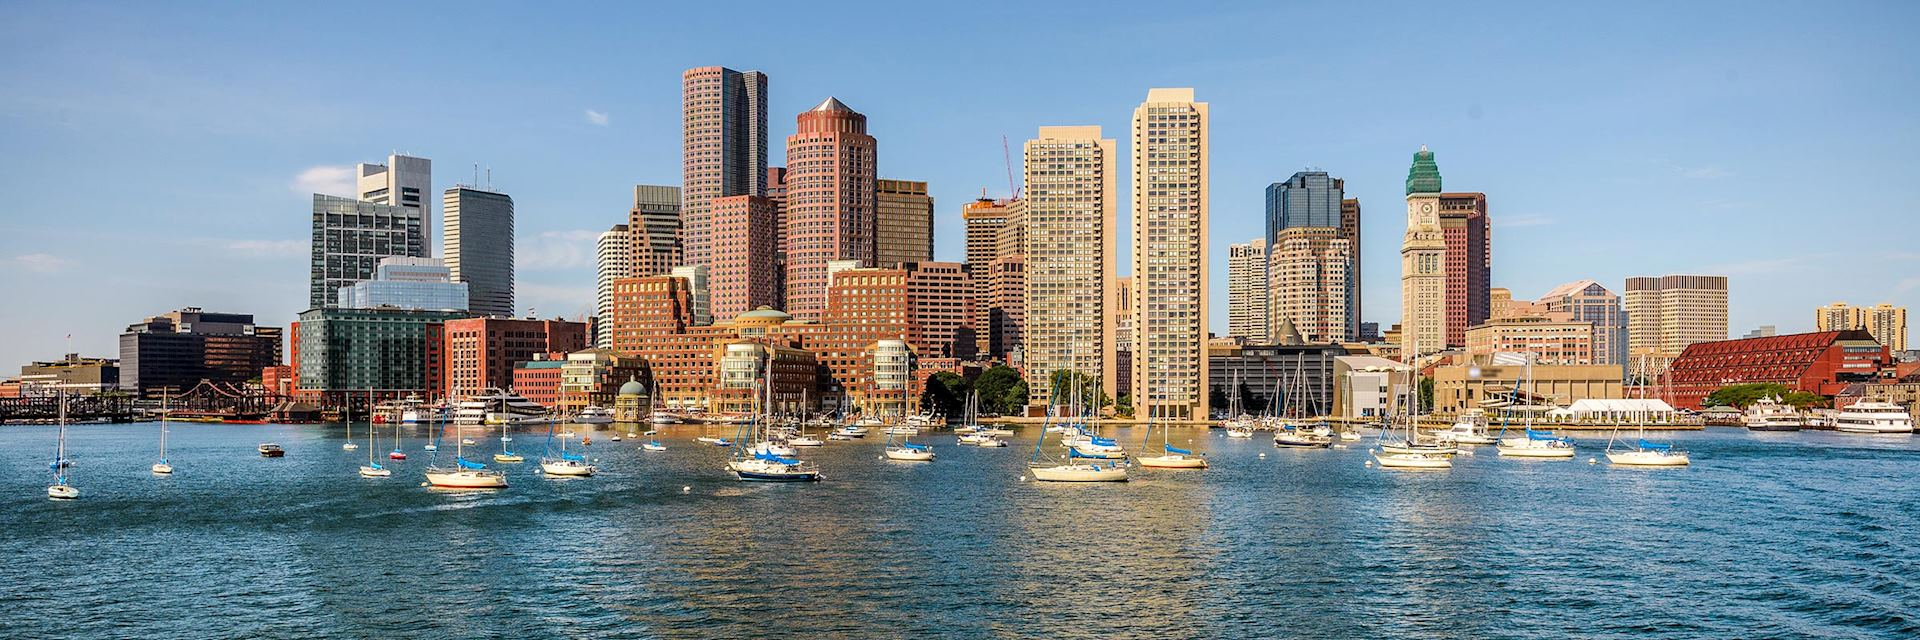 Boston waterfront, USA